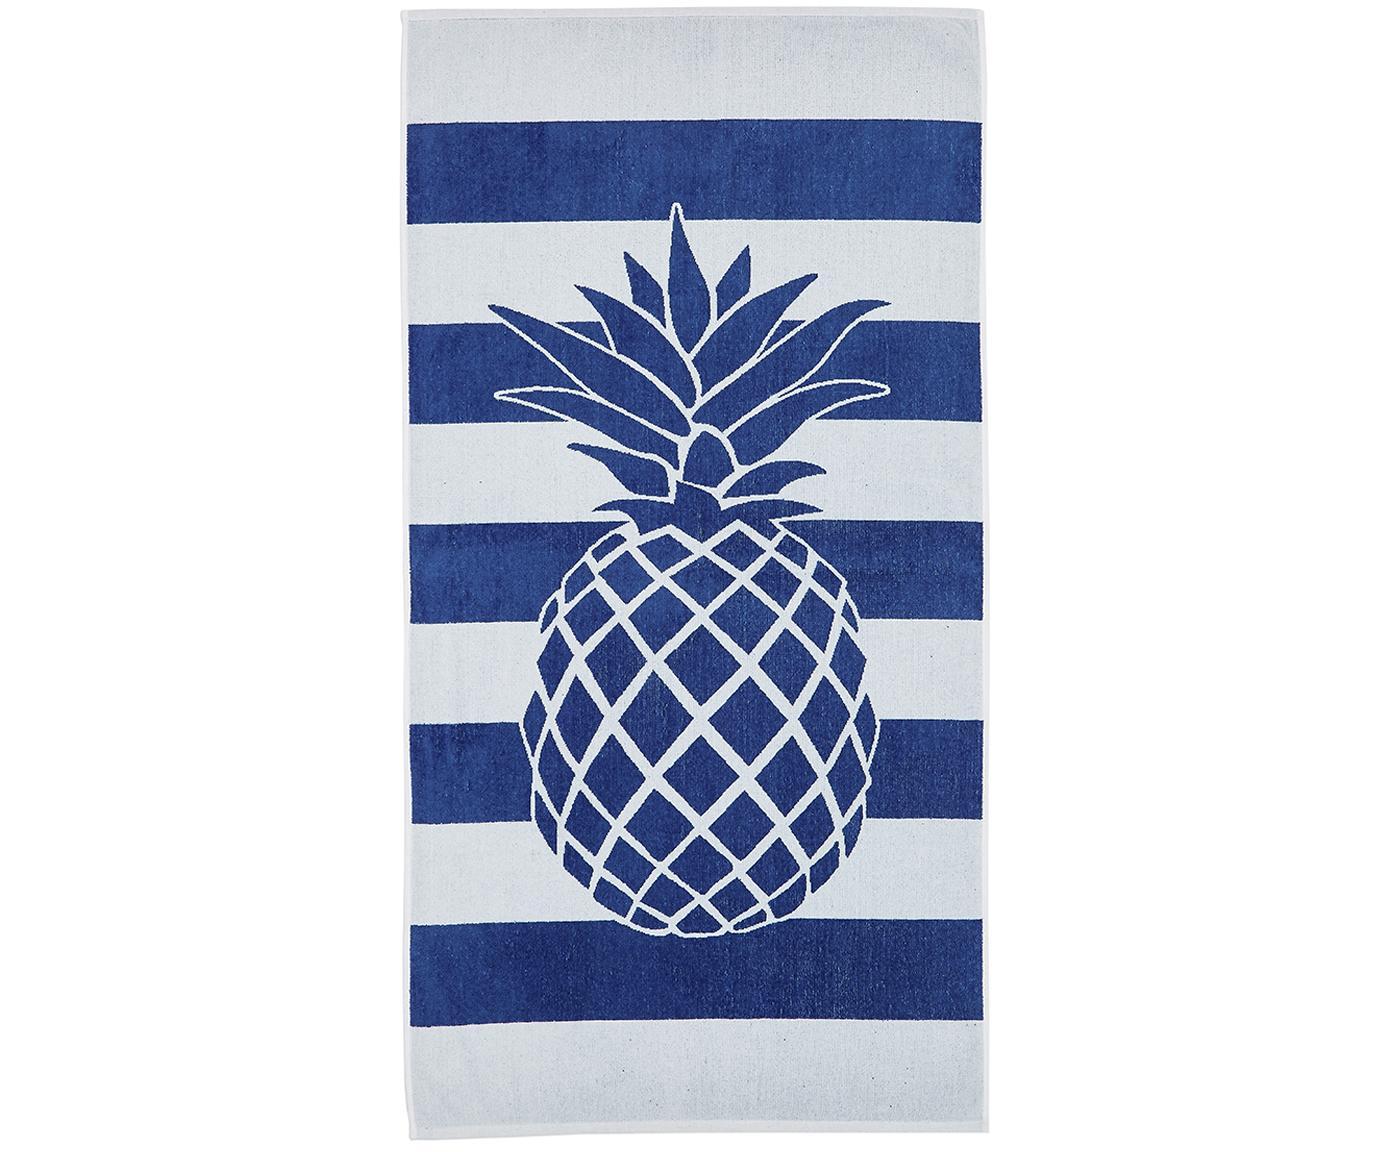 Telo mare a righe con motivo ananas Anas, Cotone Qualità leggera 380 g/m², Blu, bianco, Larg. 80 x Lung. 160 cm